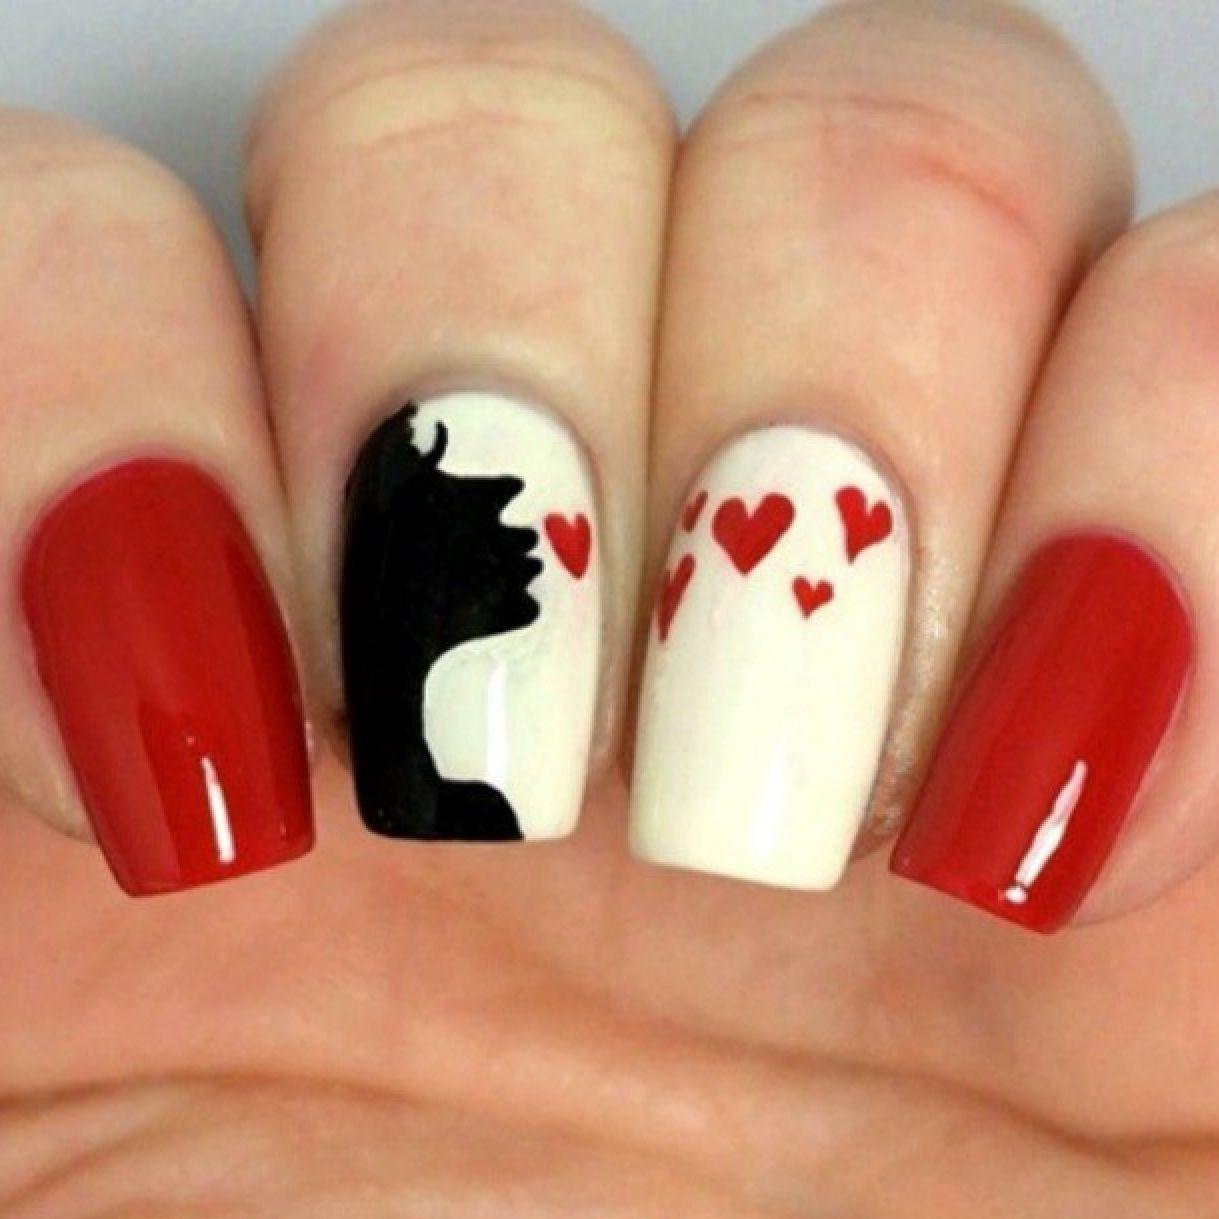 Beautiful kisses design | Nail art | Pinterest | Manicure, Nail nail ...